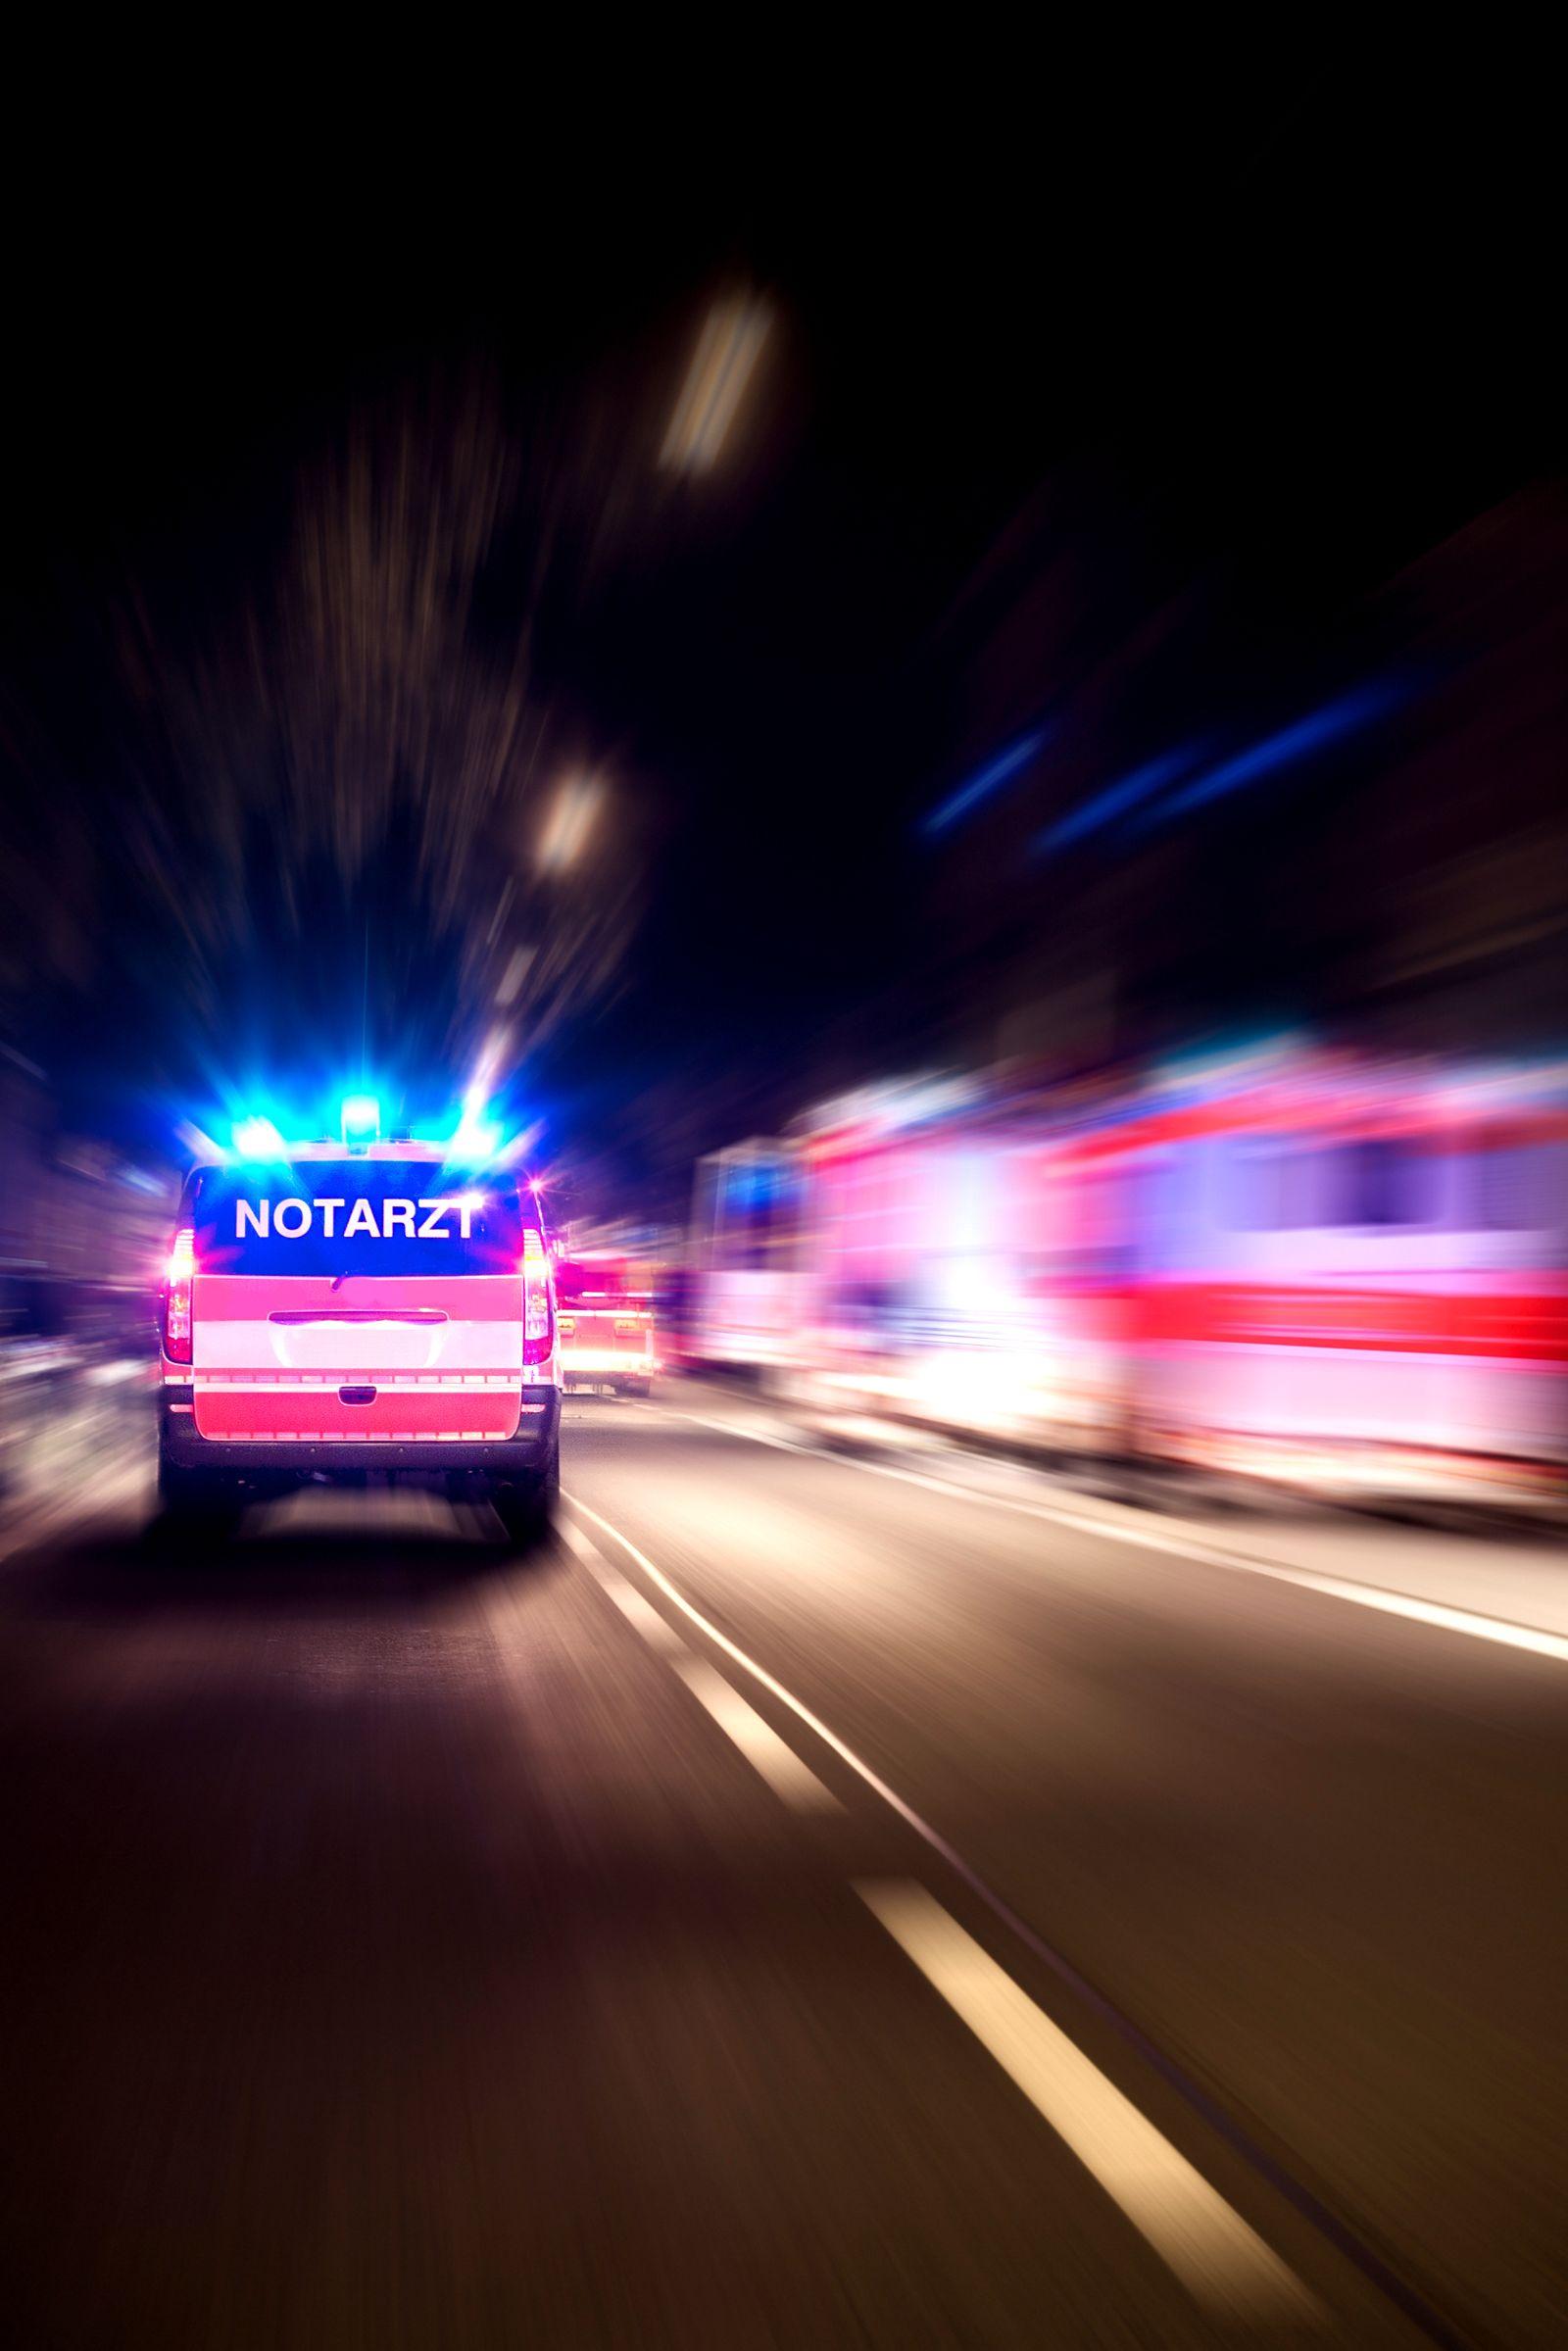 Arriving german emergency ambulance, motion blur